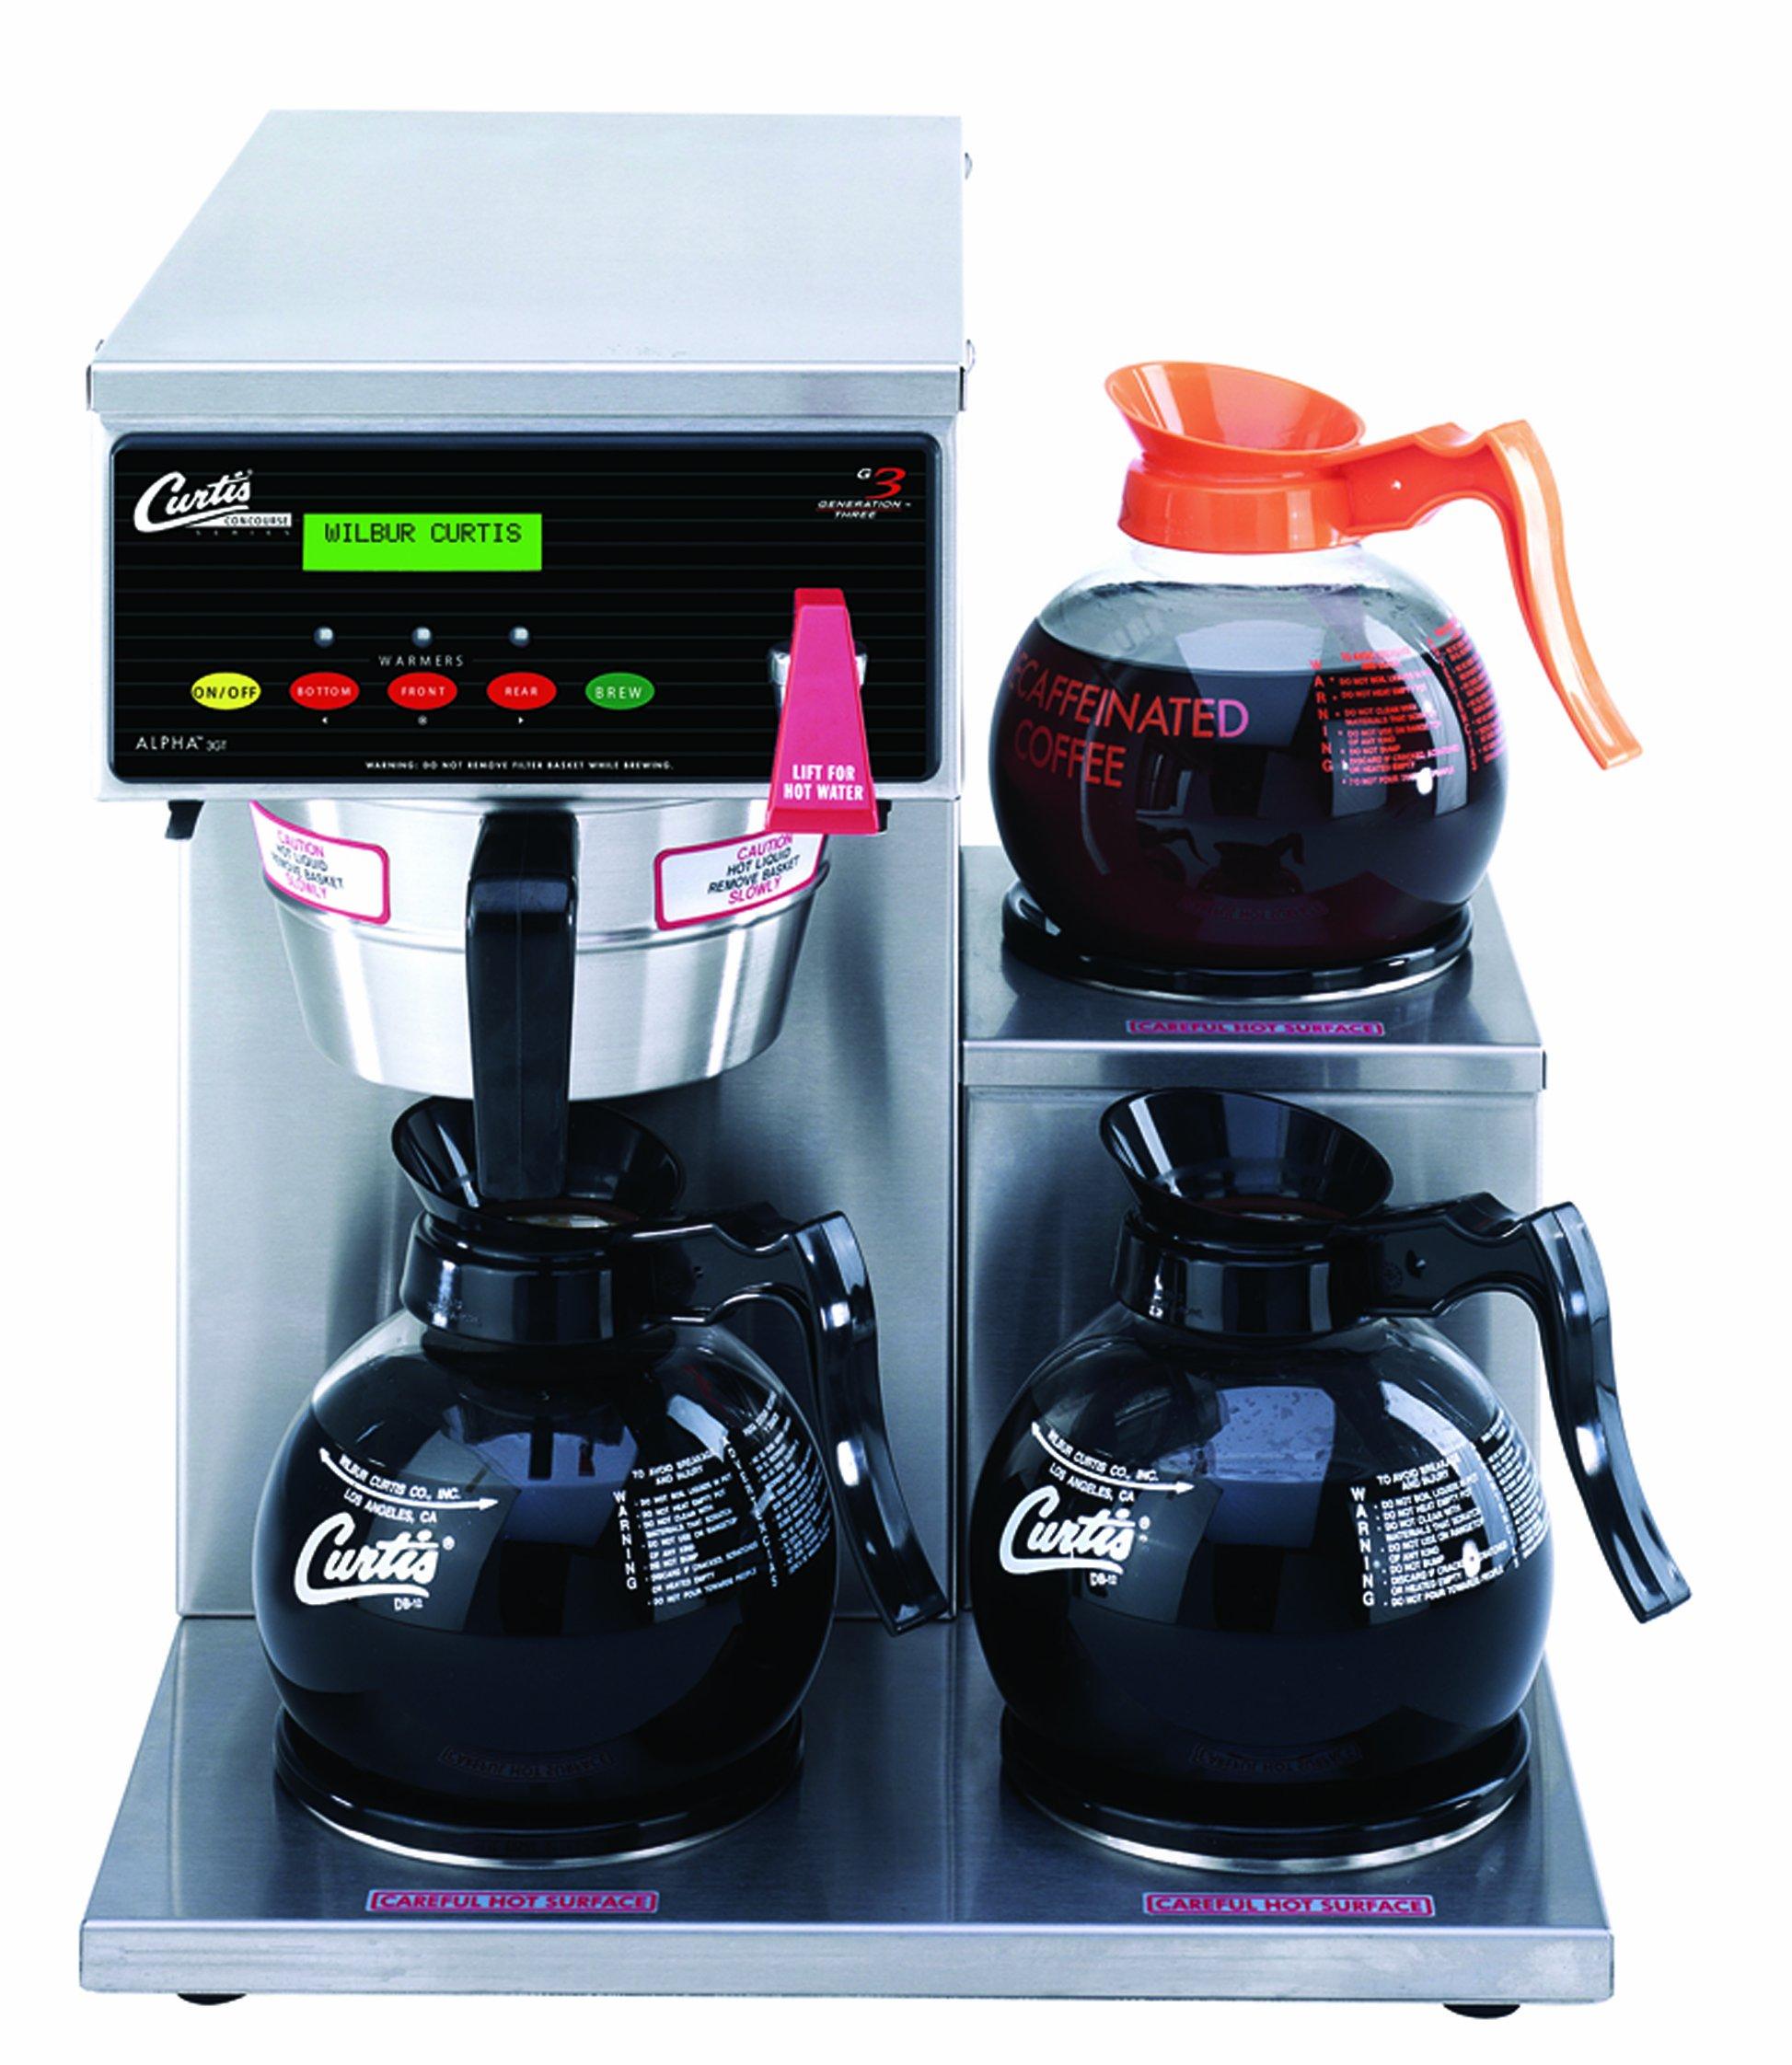 Wilbur Curtis G3 Alpha Decanter Brewer 64 Oz Coffee Brewer, 3 Station, 3 Lower Right Warmer - Commercial Coffee Brewer  - ALP3GTR12A000 (Each)